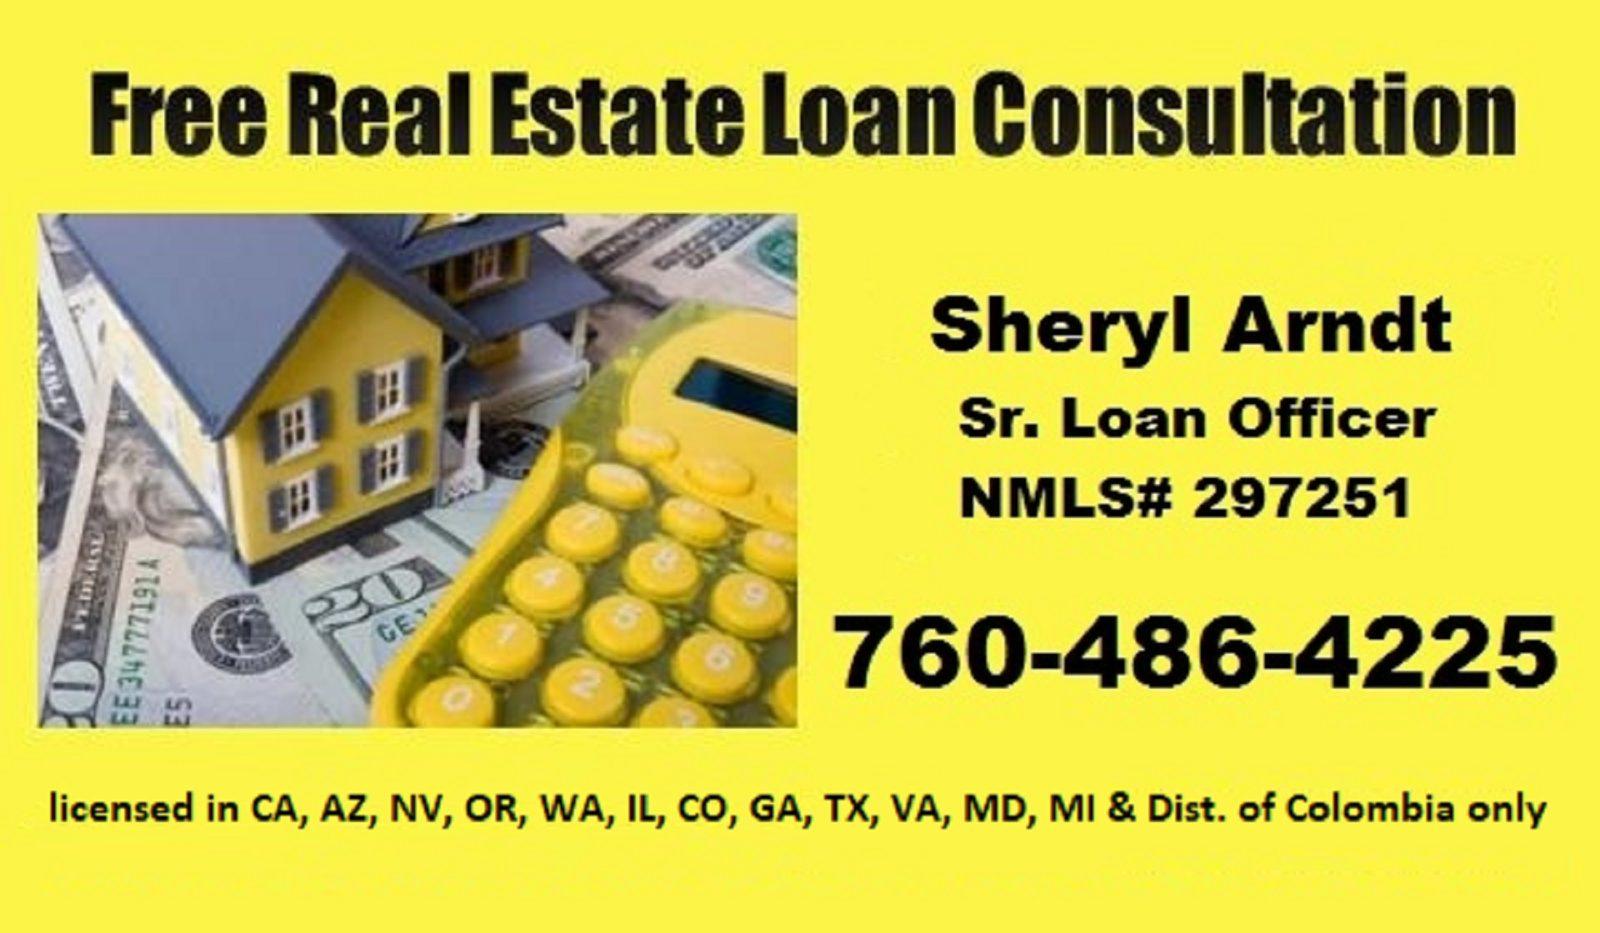 Free-Real-Estate-Loan-Consultation-Sheryl-Arndt-1600x933